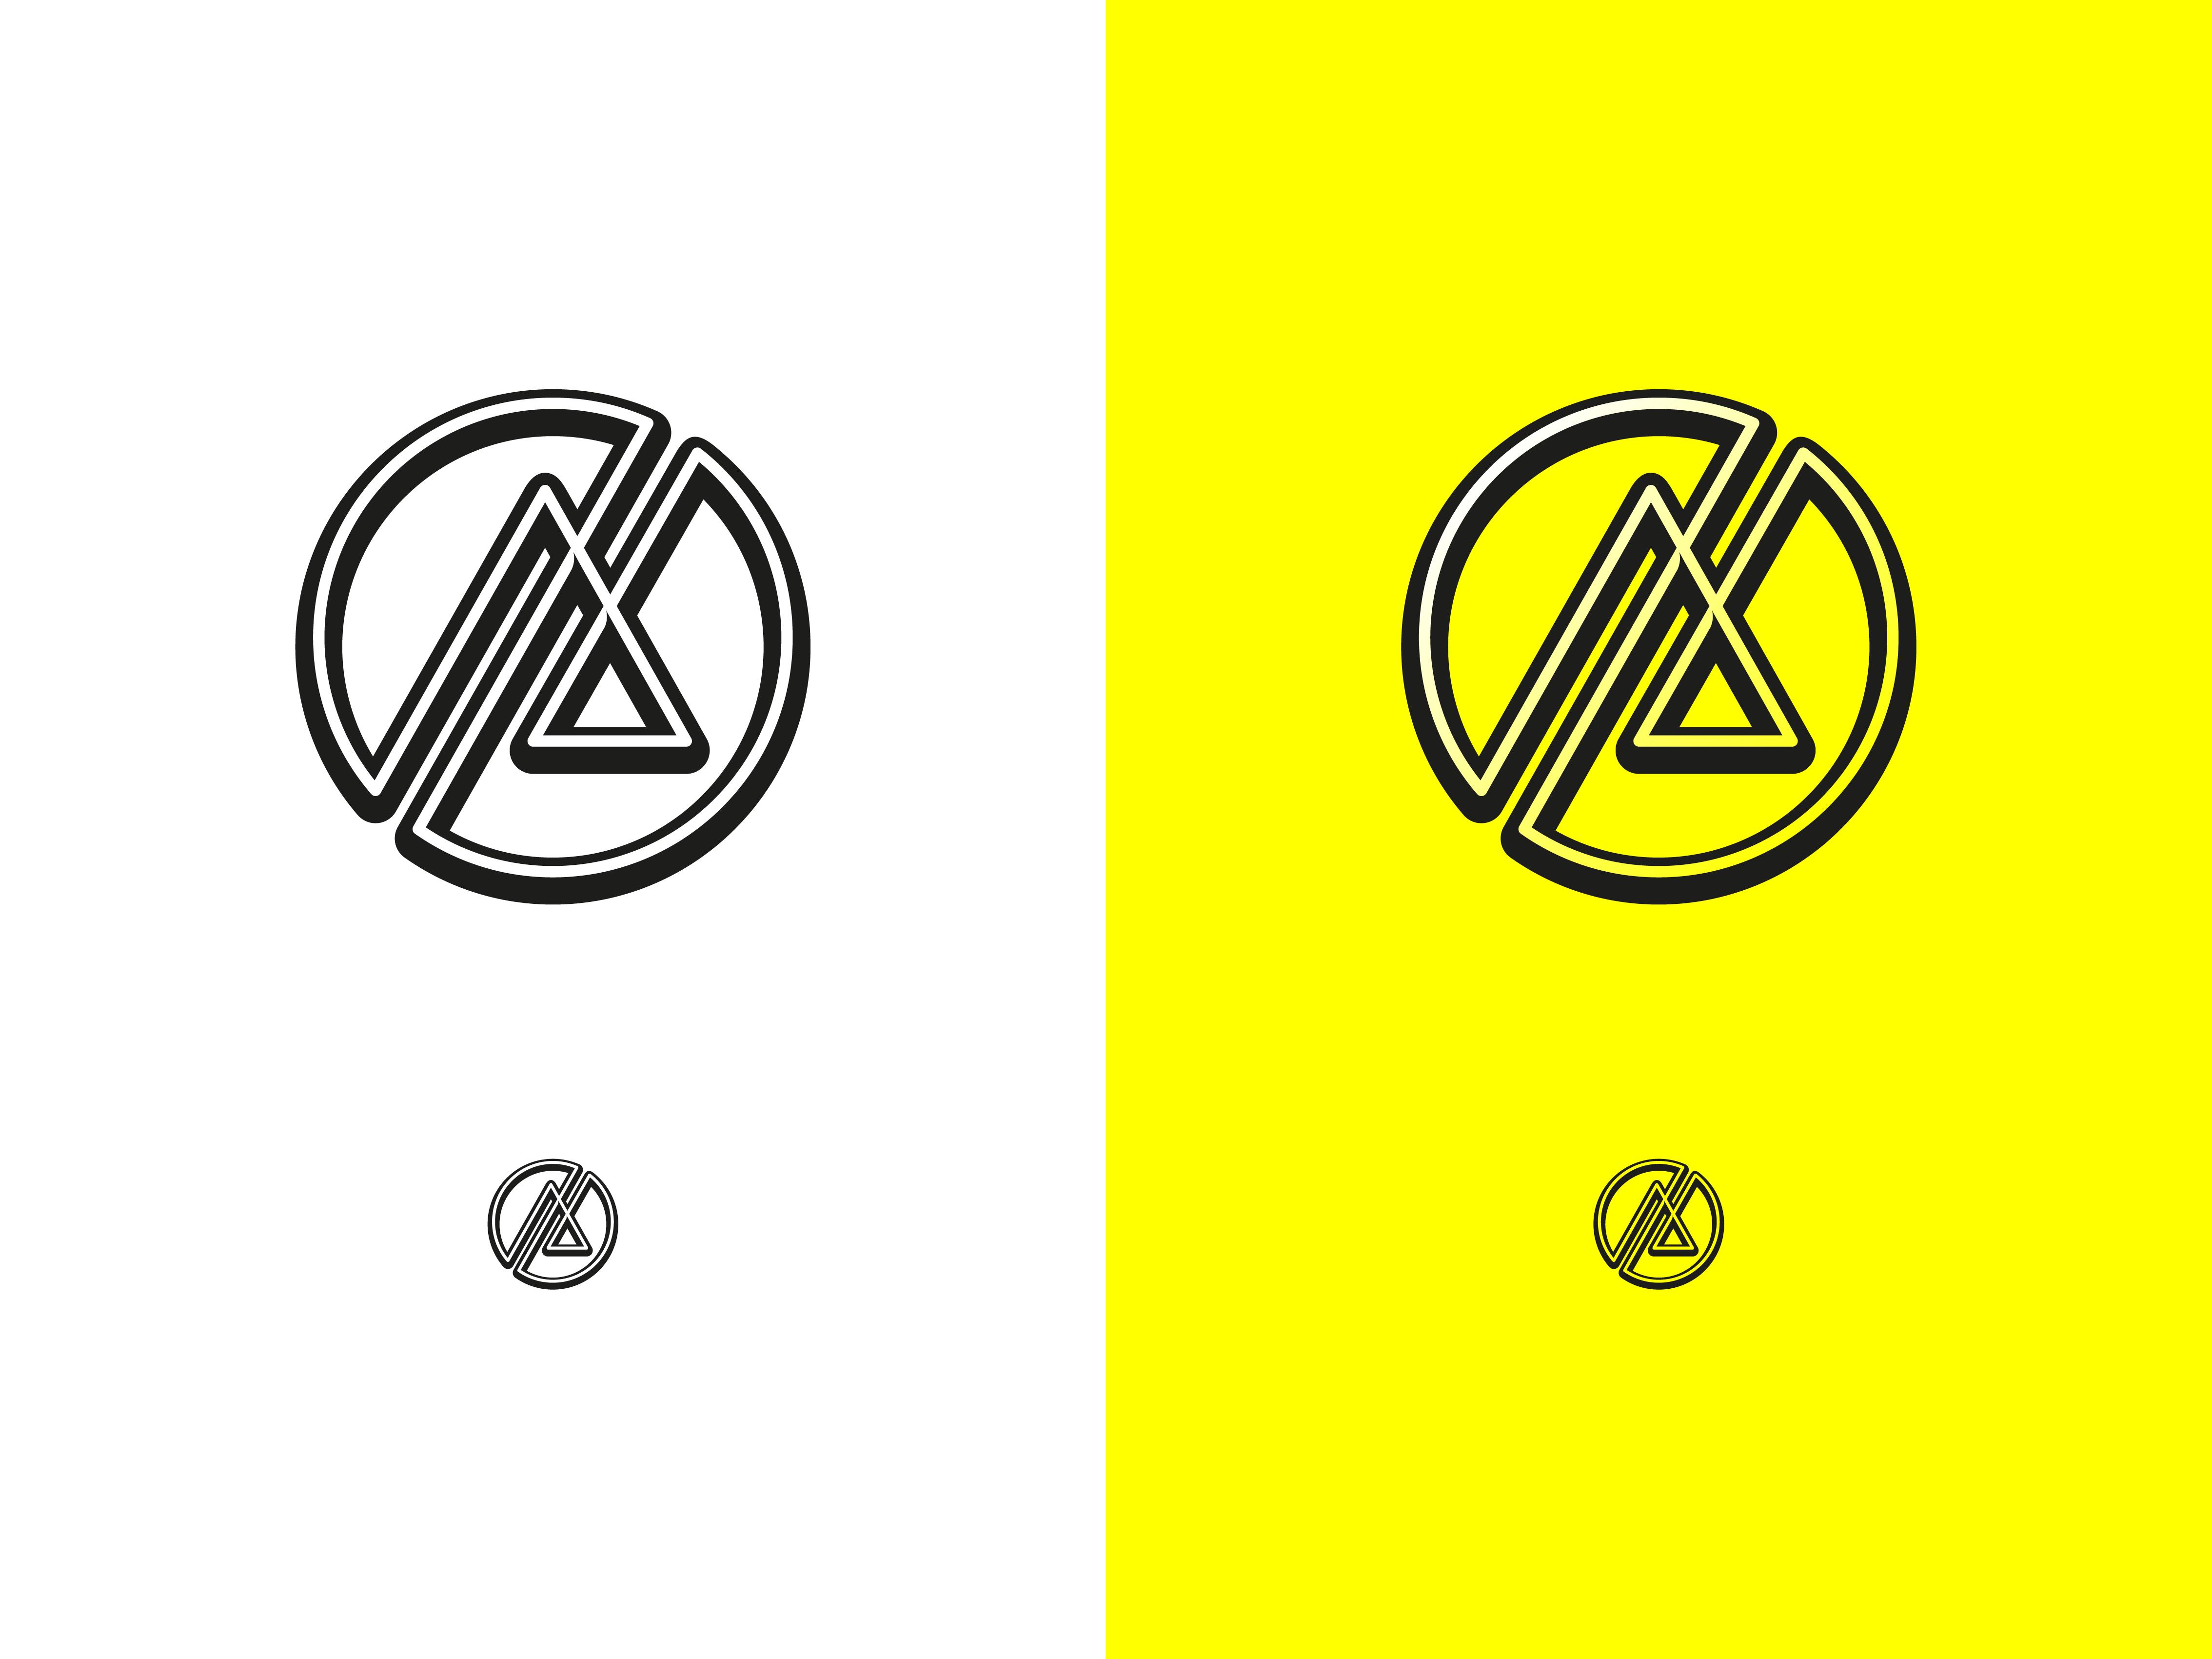 Al Monogram By Alex Lockey On Dribbble